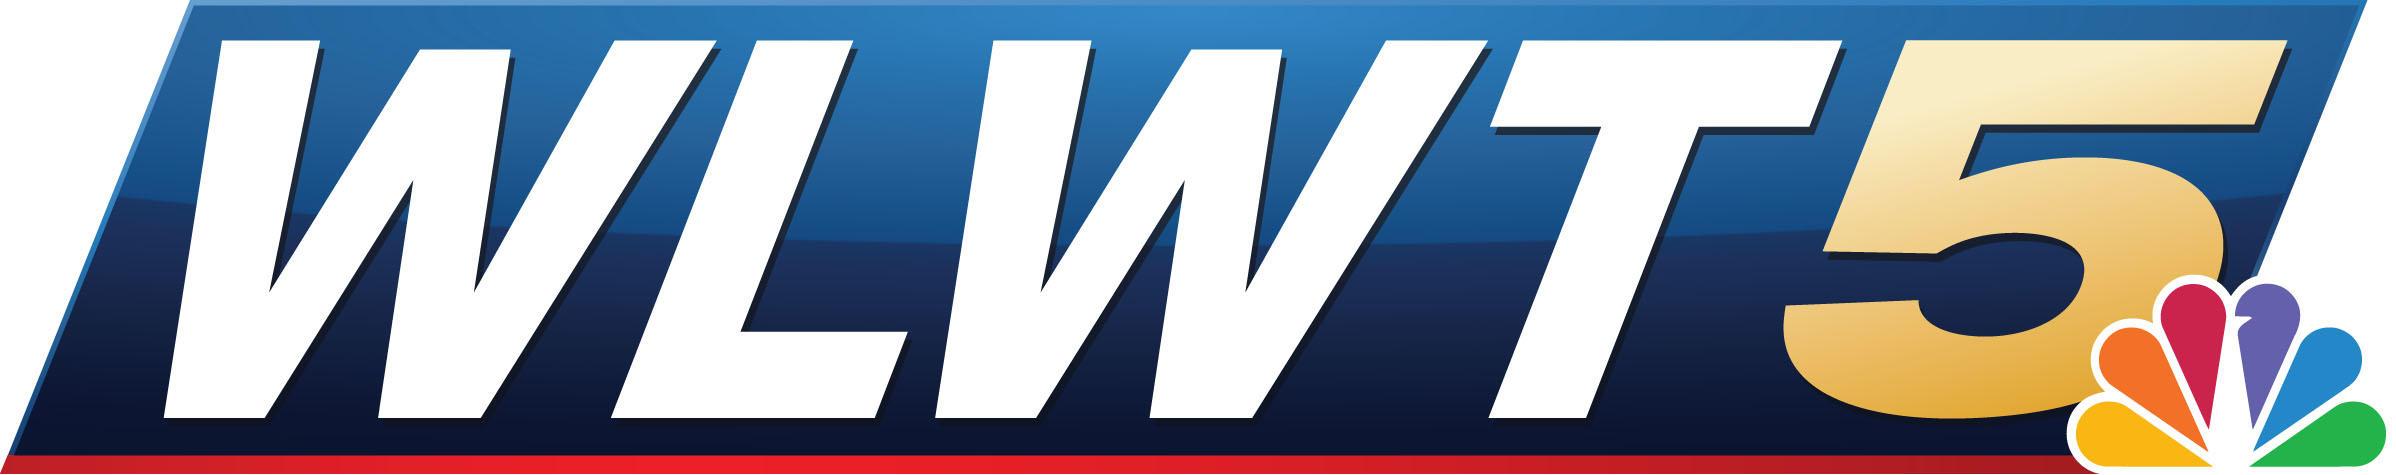 70 Reasons To Celebrate Wlwt Tvs 70th Birthday Wvxu